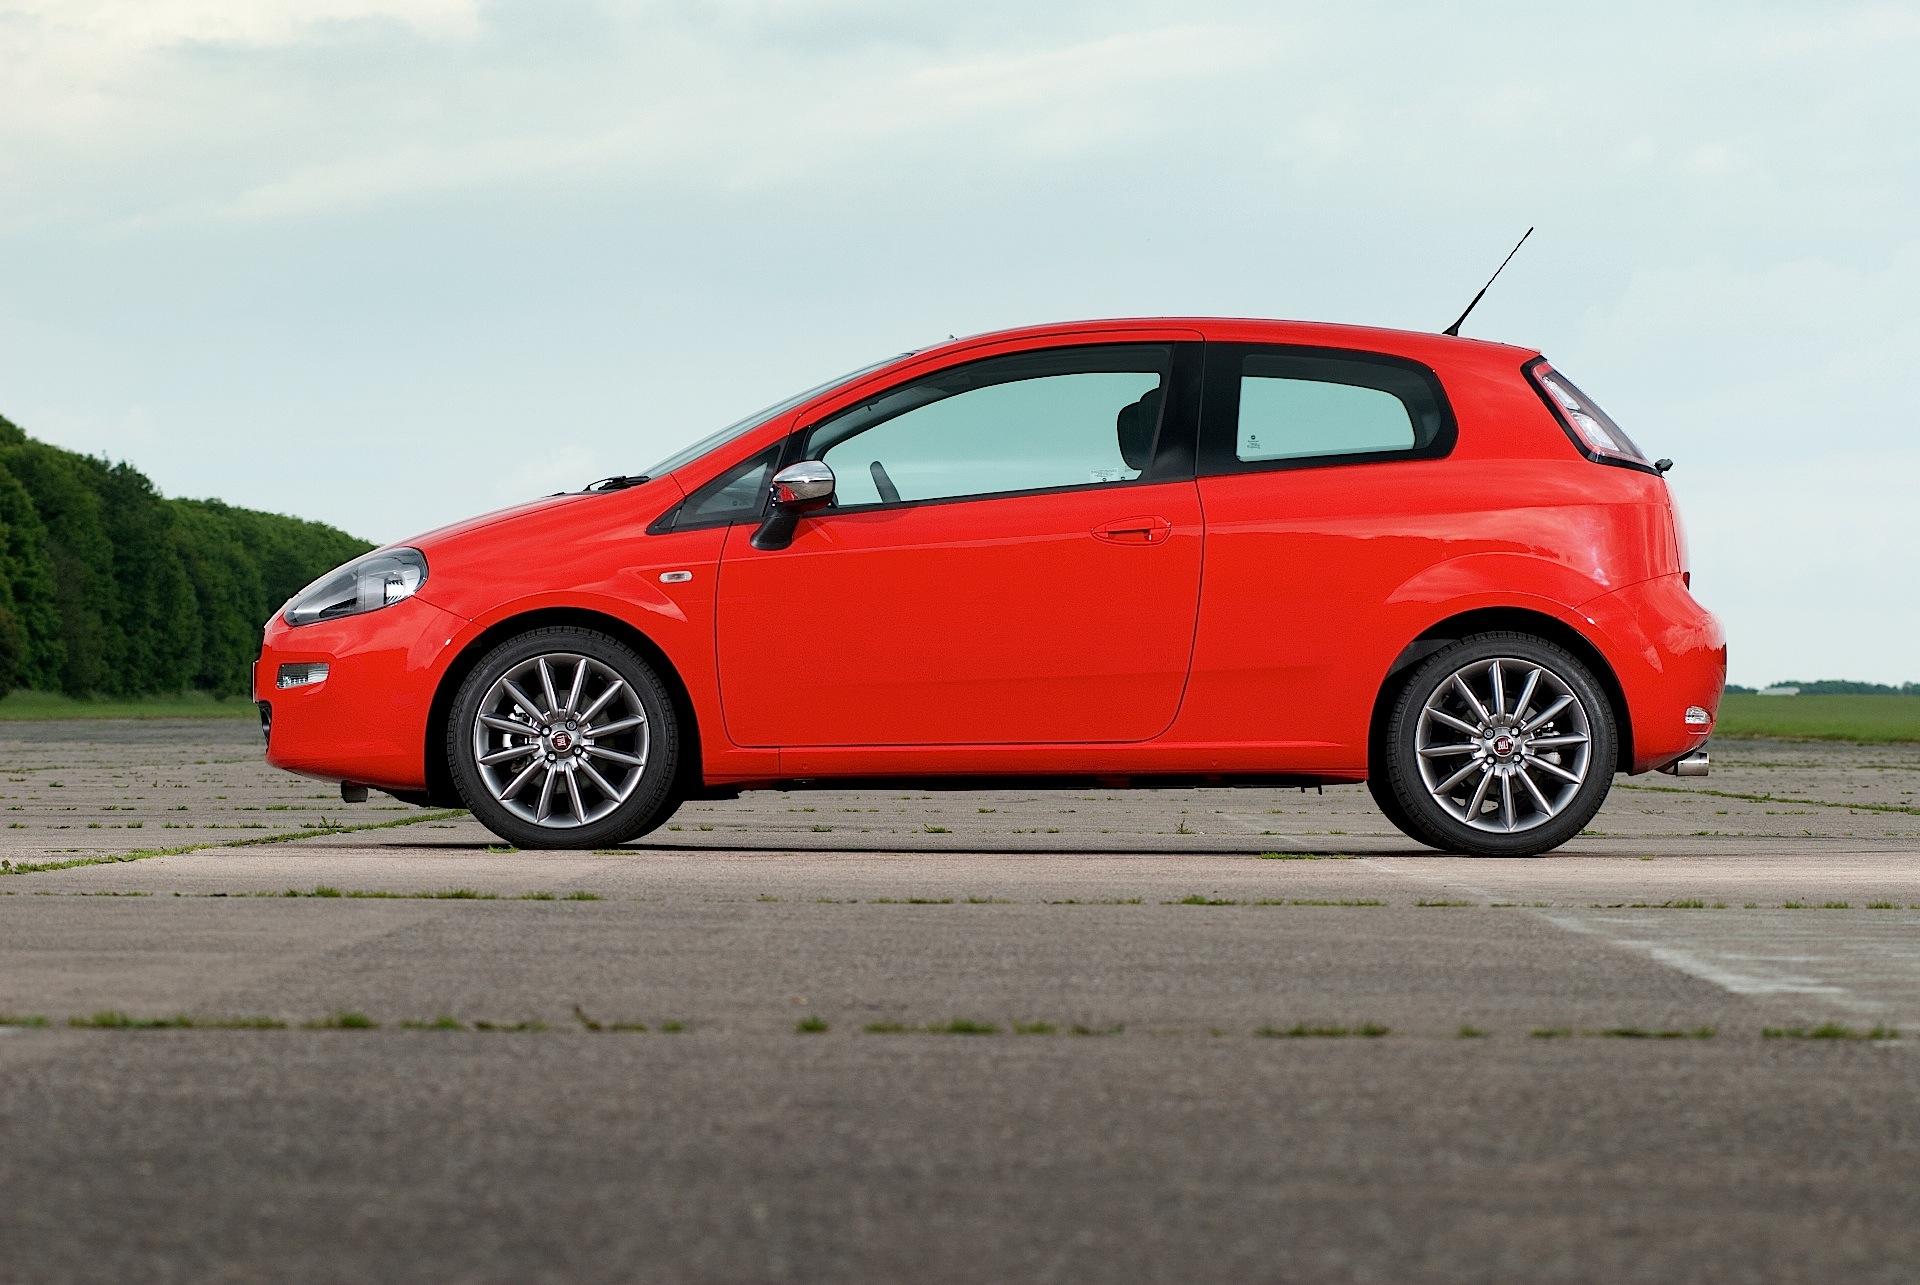 Fiat Punto 3 Doors Specs Photos 2012 2013 2014 2015 2016 2017 2018 Autoevolution